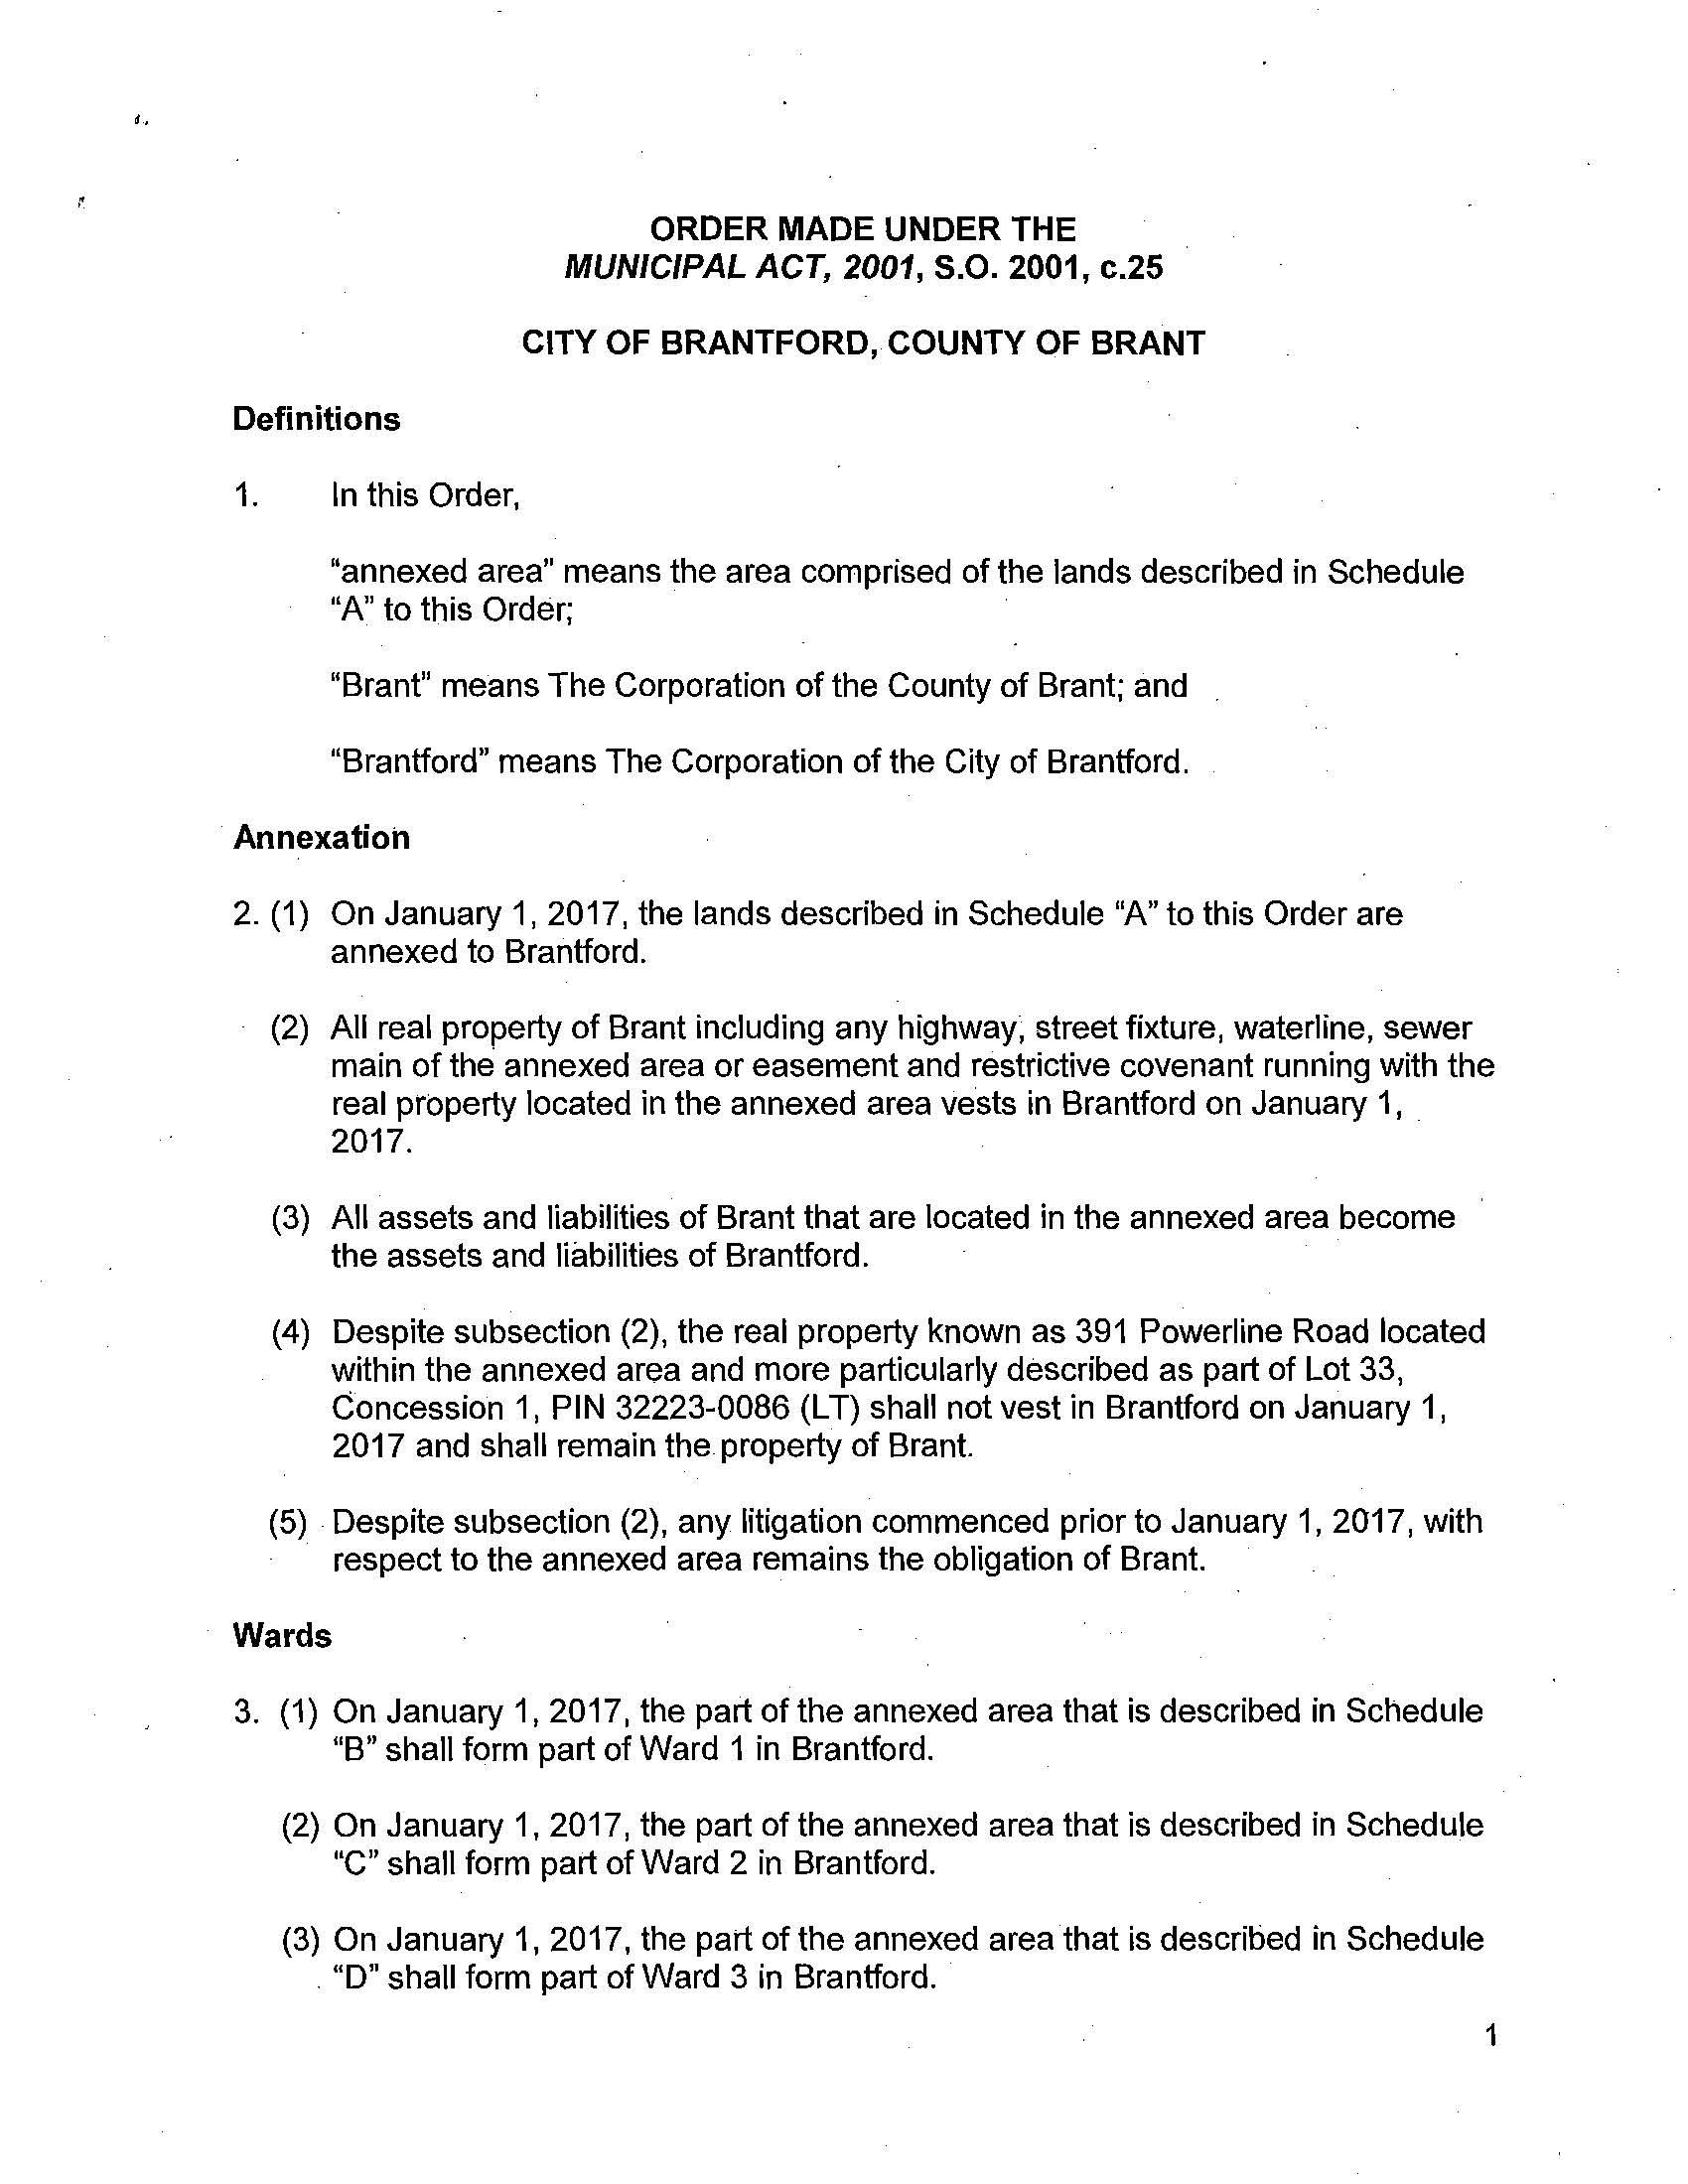 Brantford_Boundary_Signed_Order_Page_01.jpg